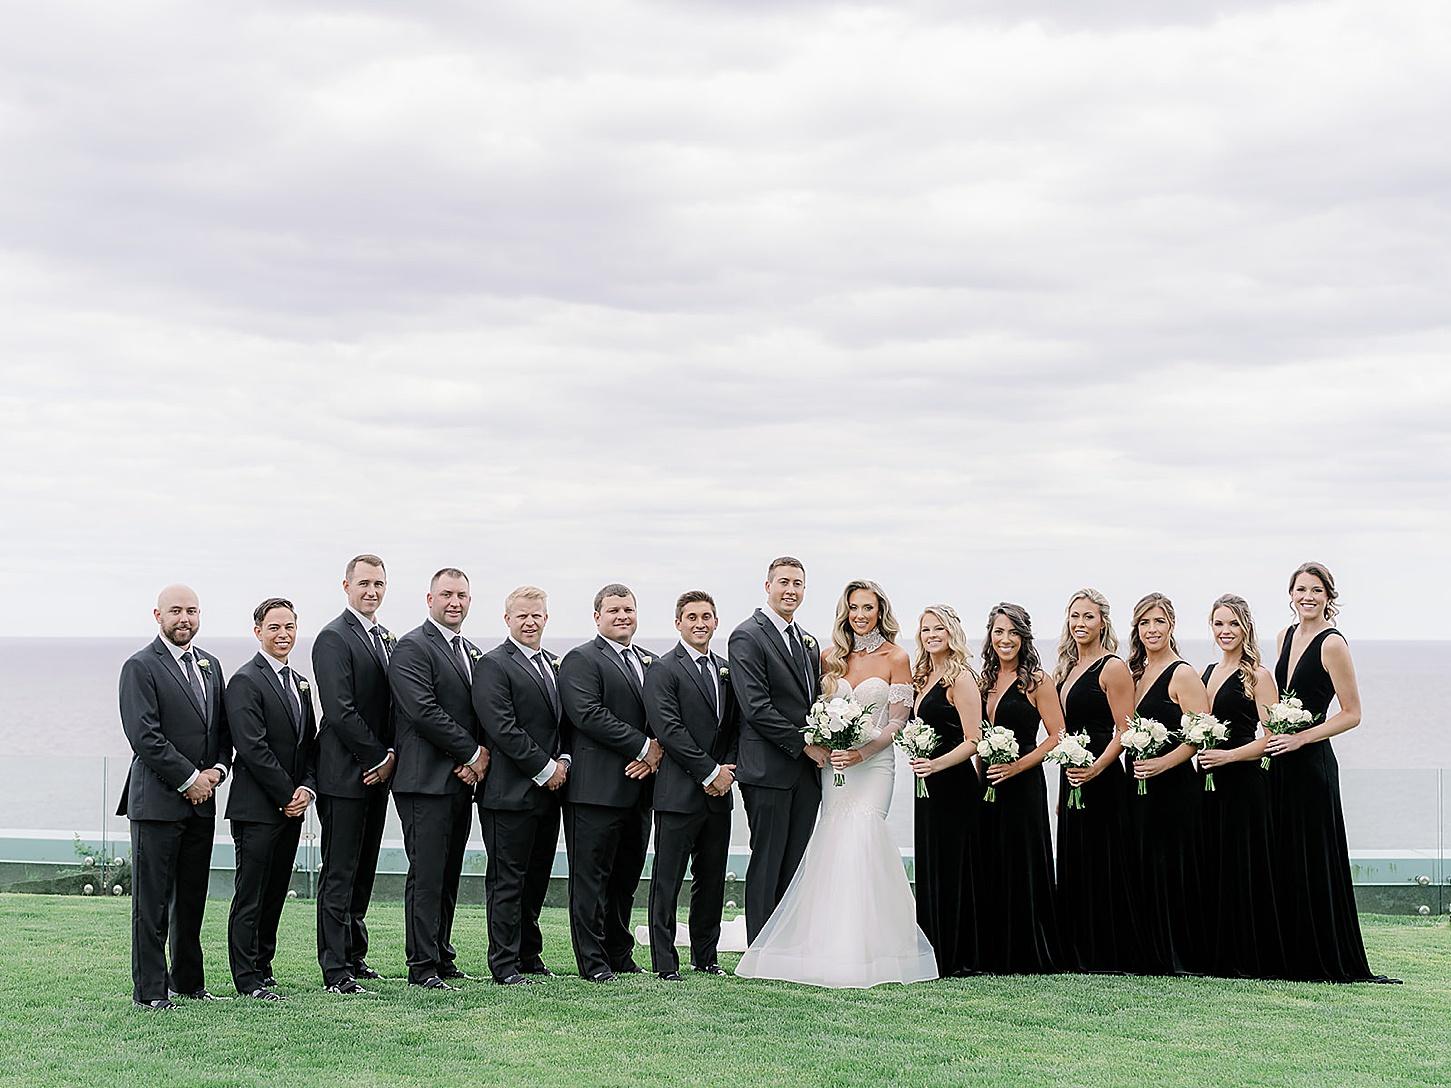 Atlantic City Wedding Photography Studio by Magdalena Studios Lexy Cha 0038